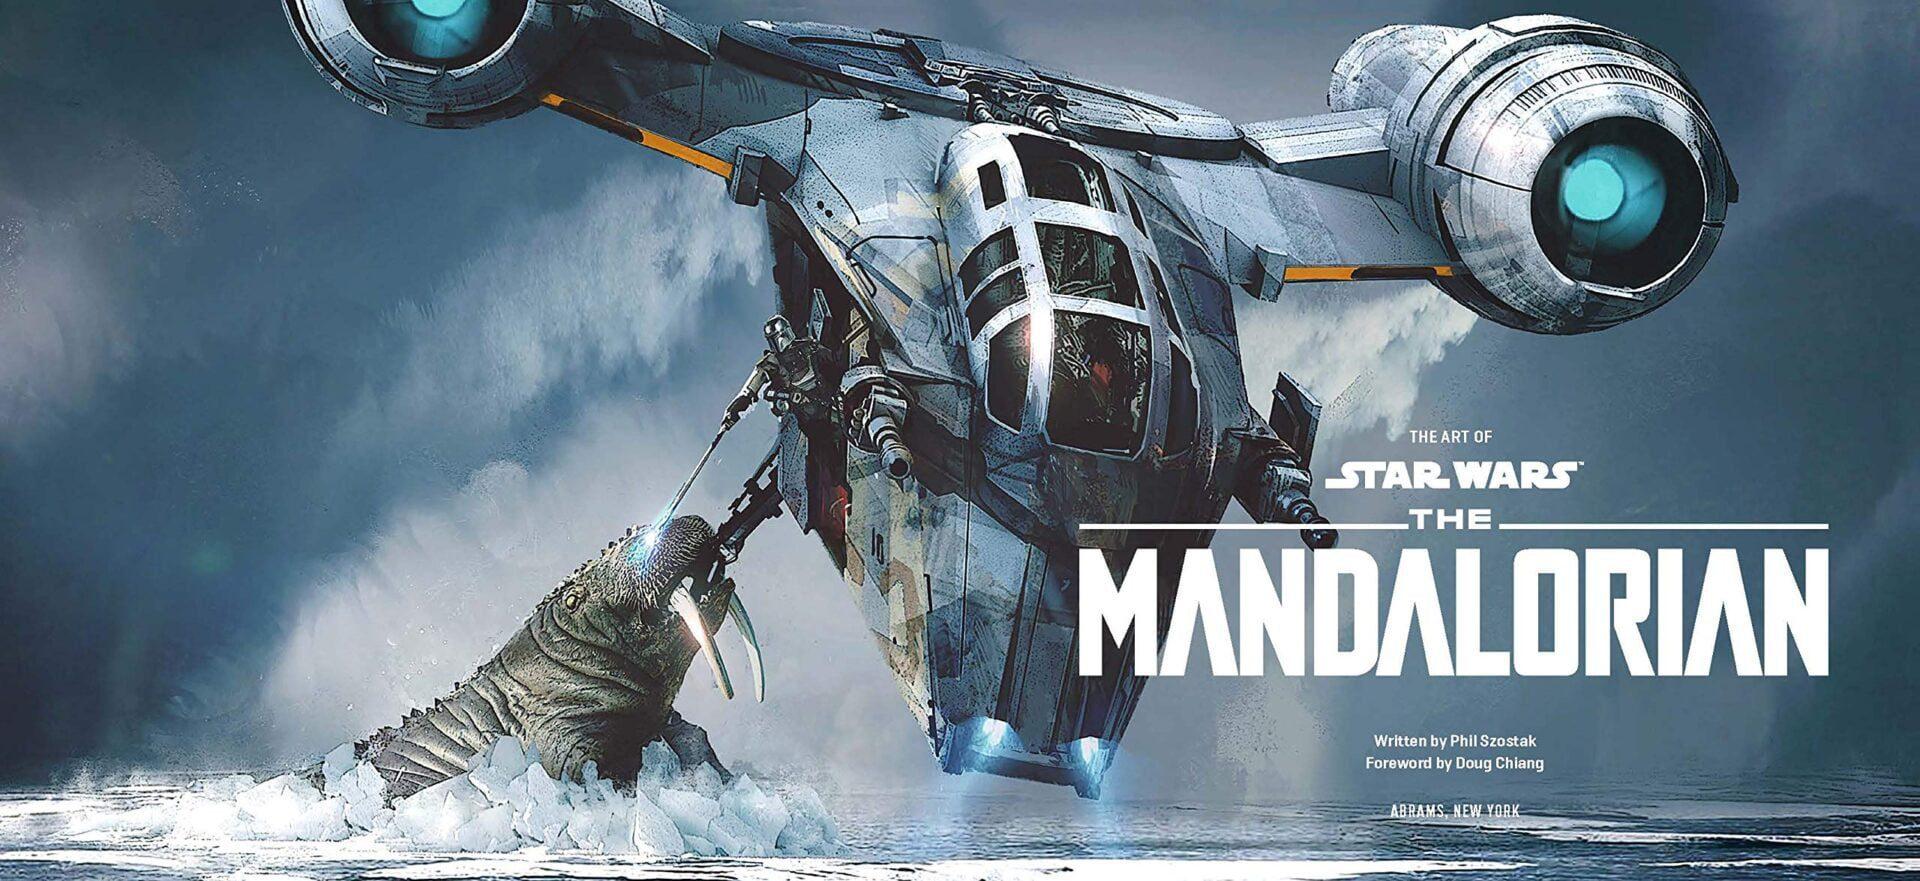 The Art of Star Wars: The Mandalorian   Art Book